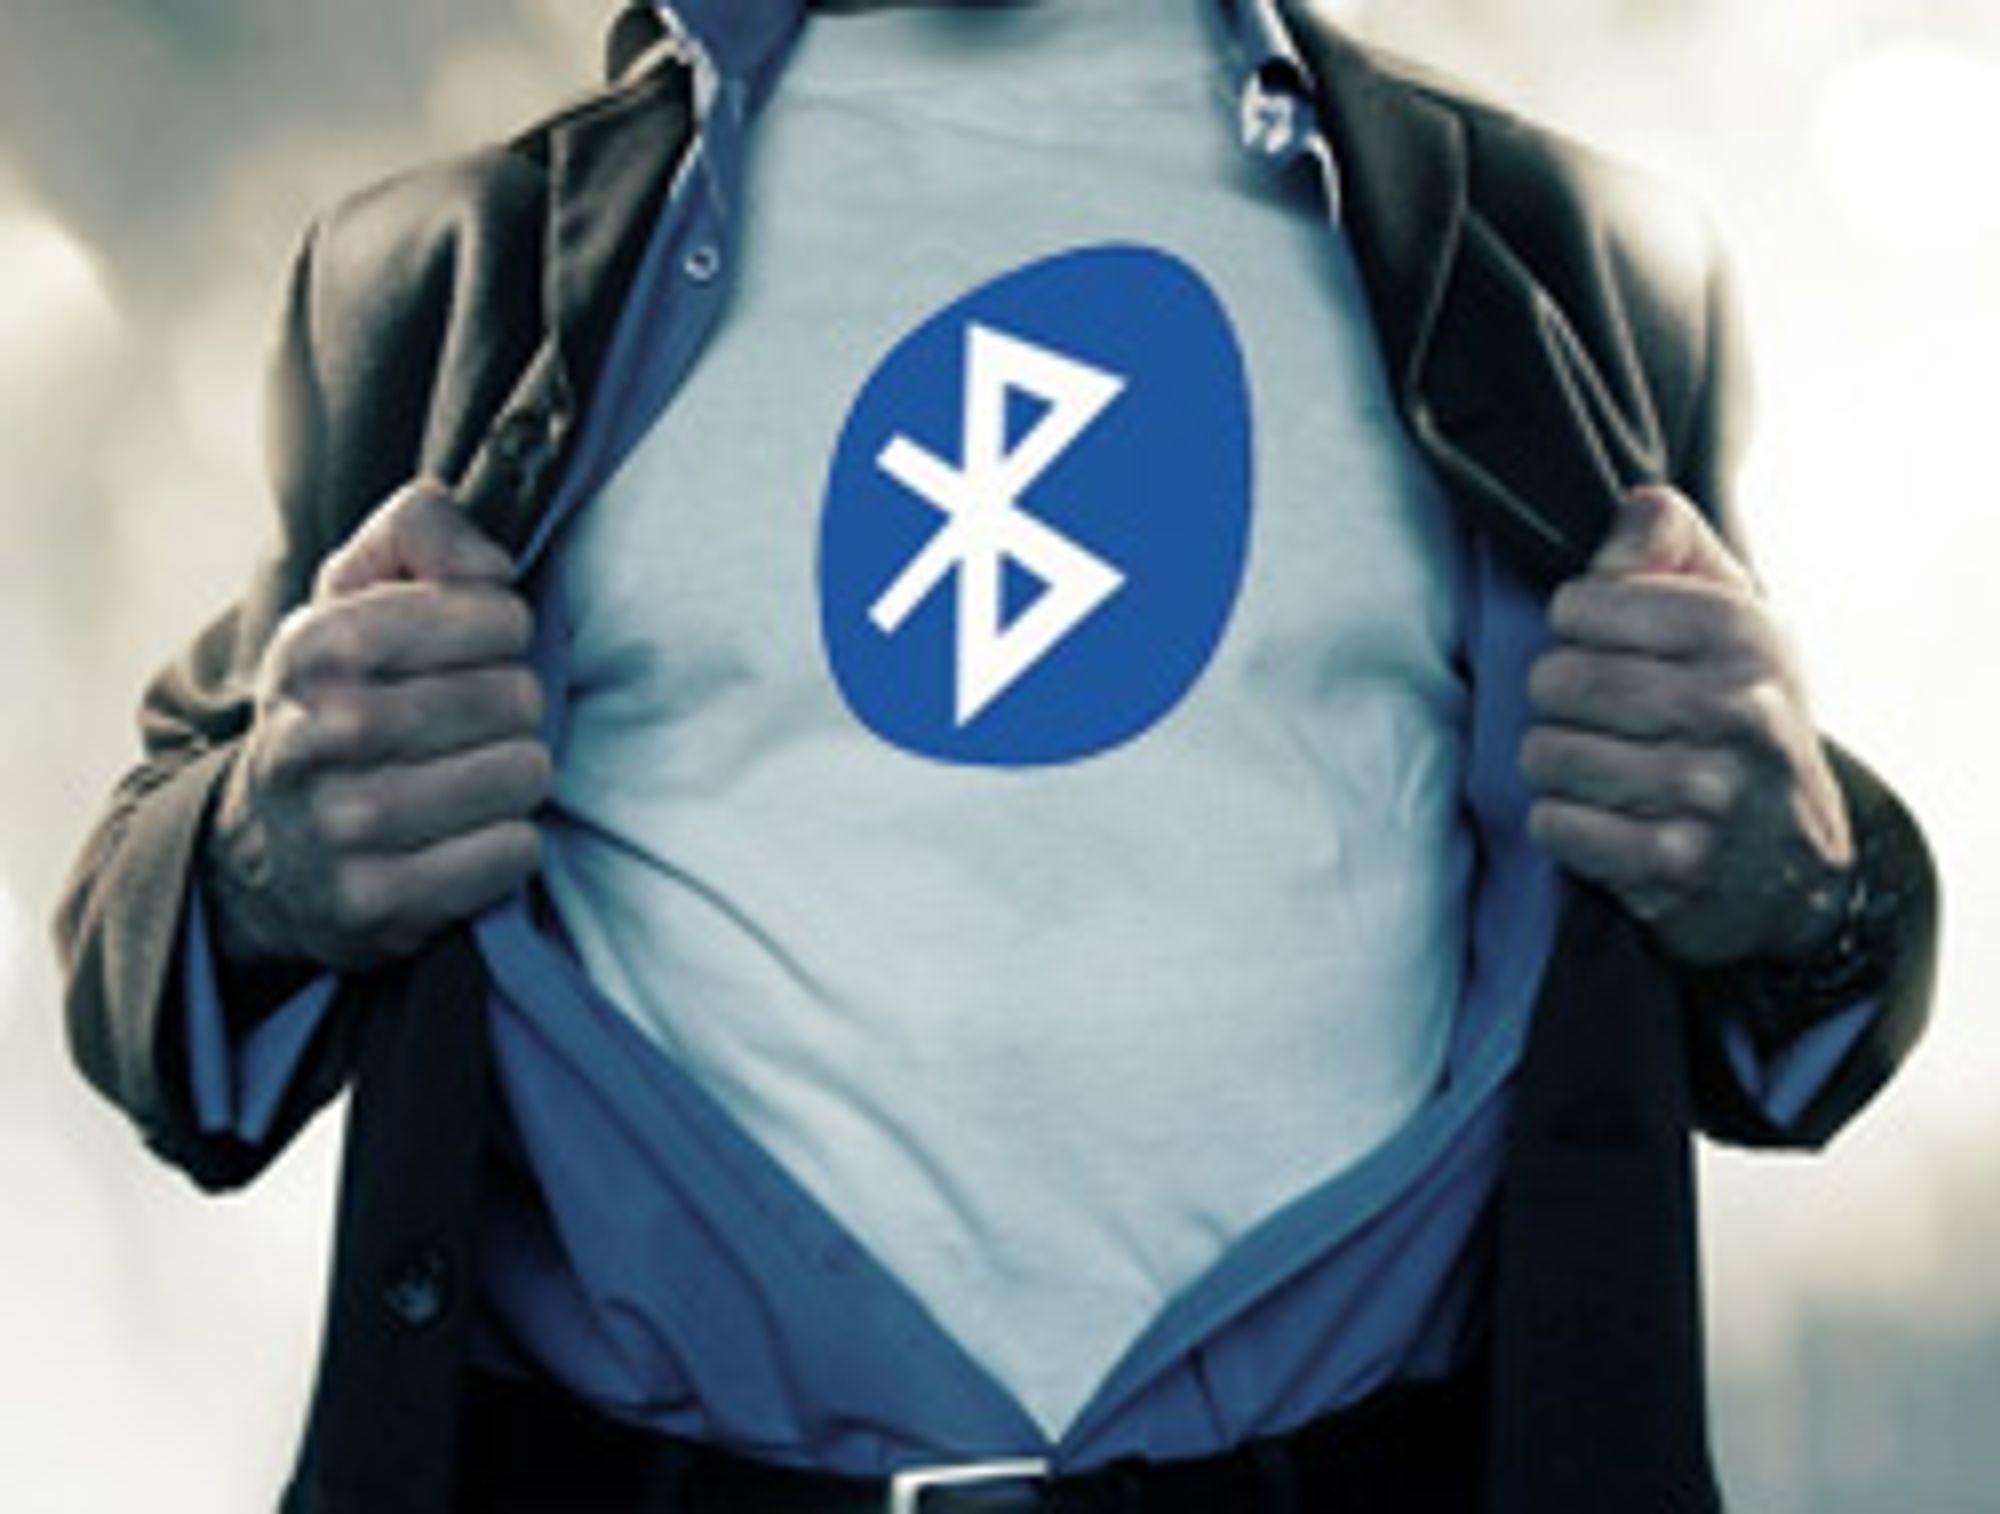 Bluetooth 3.0 har landet. (Bilde: Istockphoto/Illustrasjon)